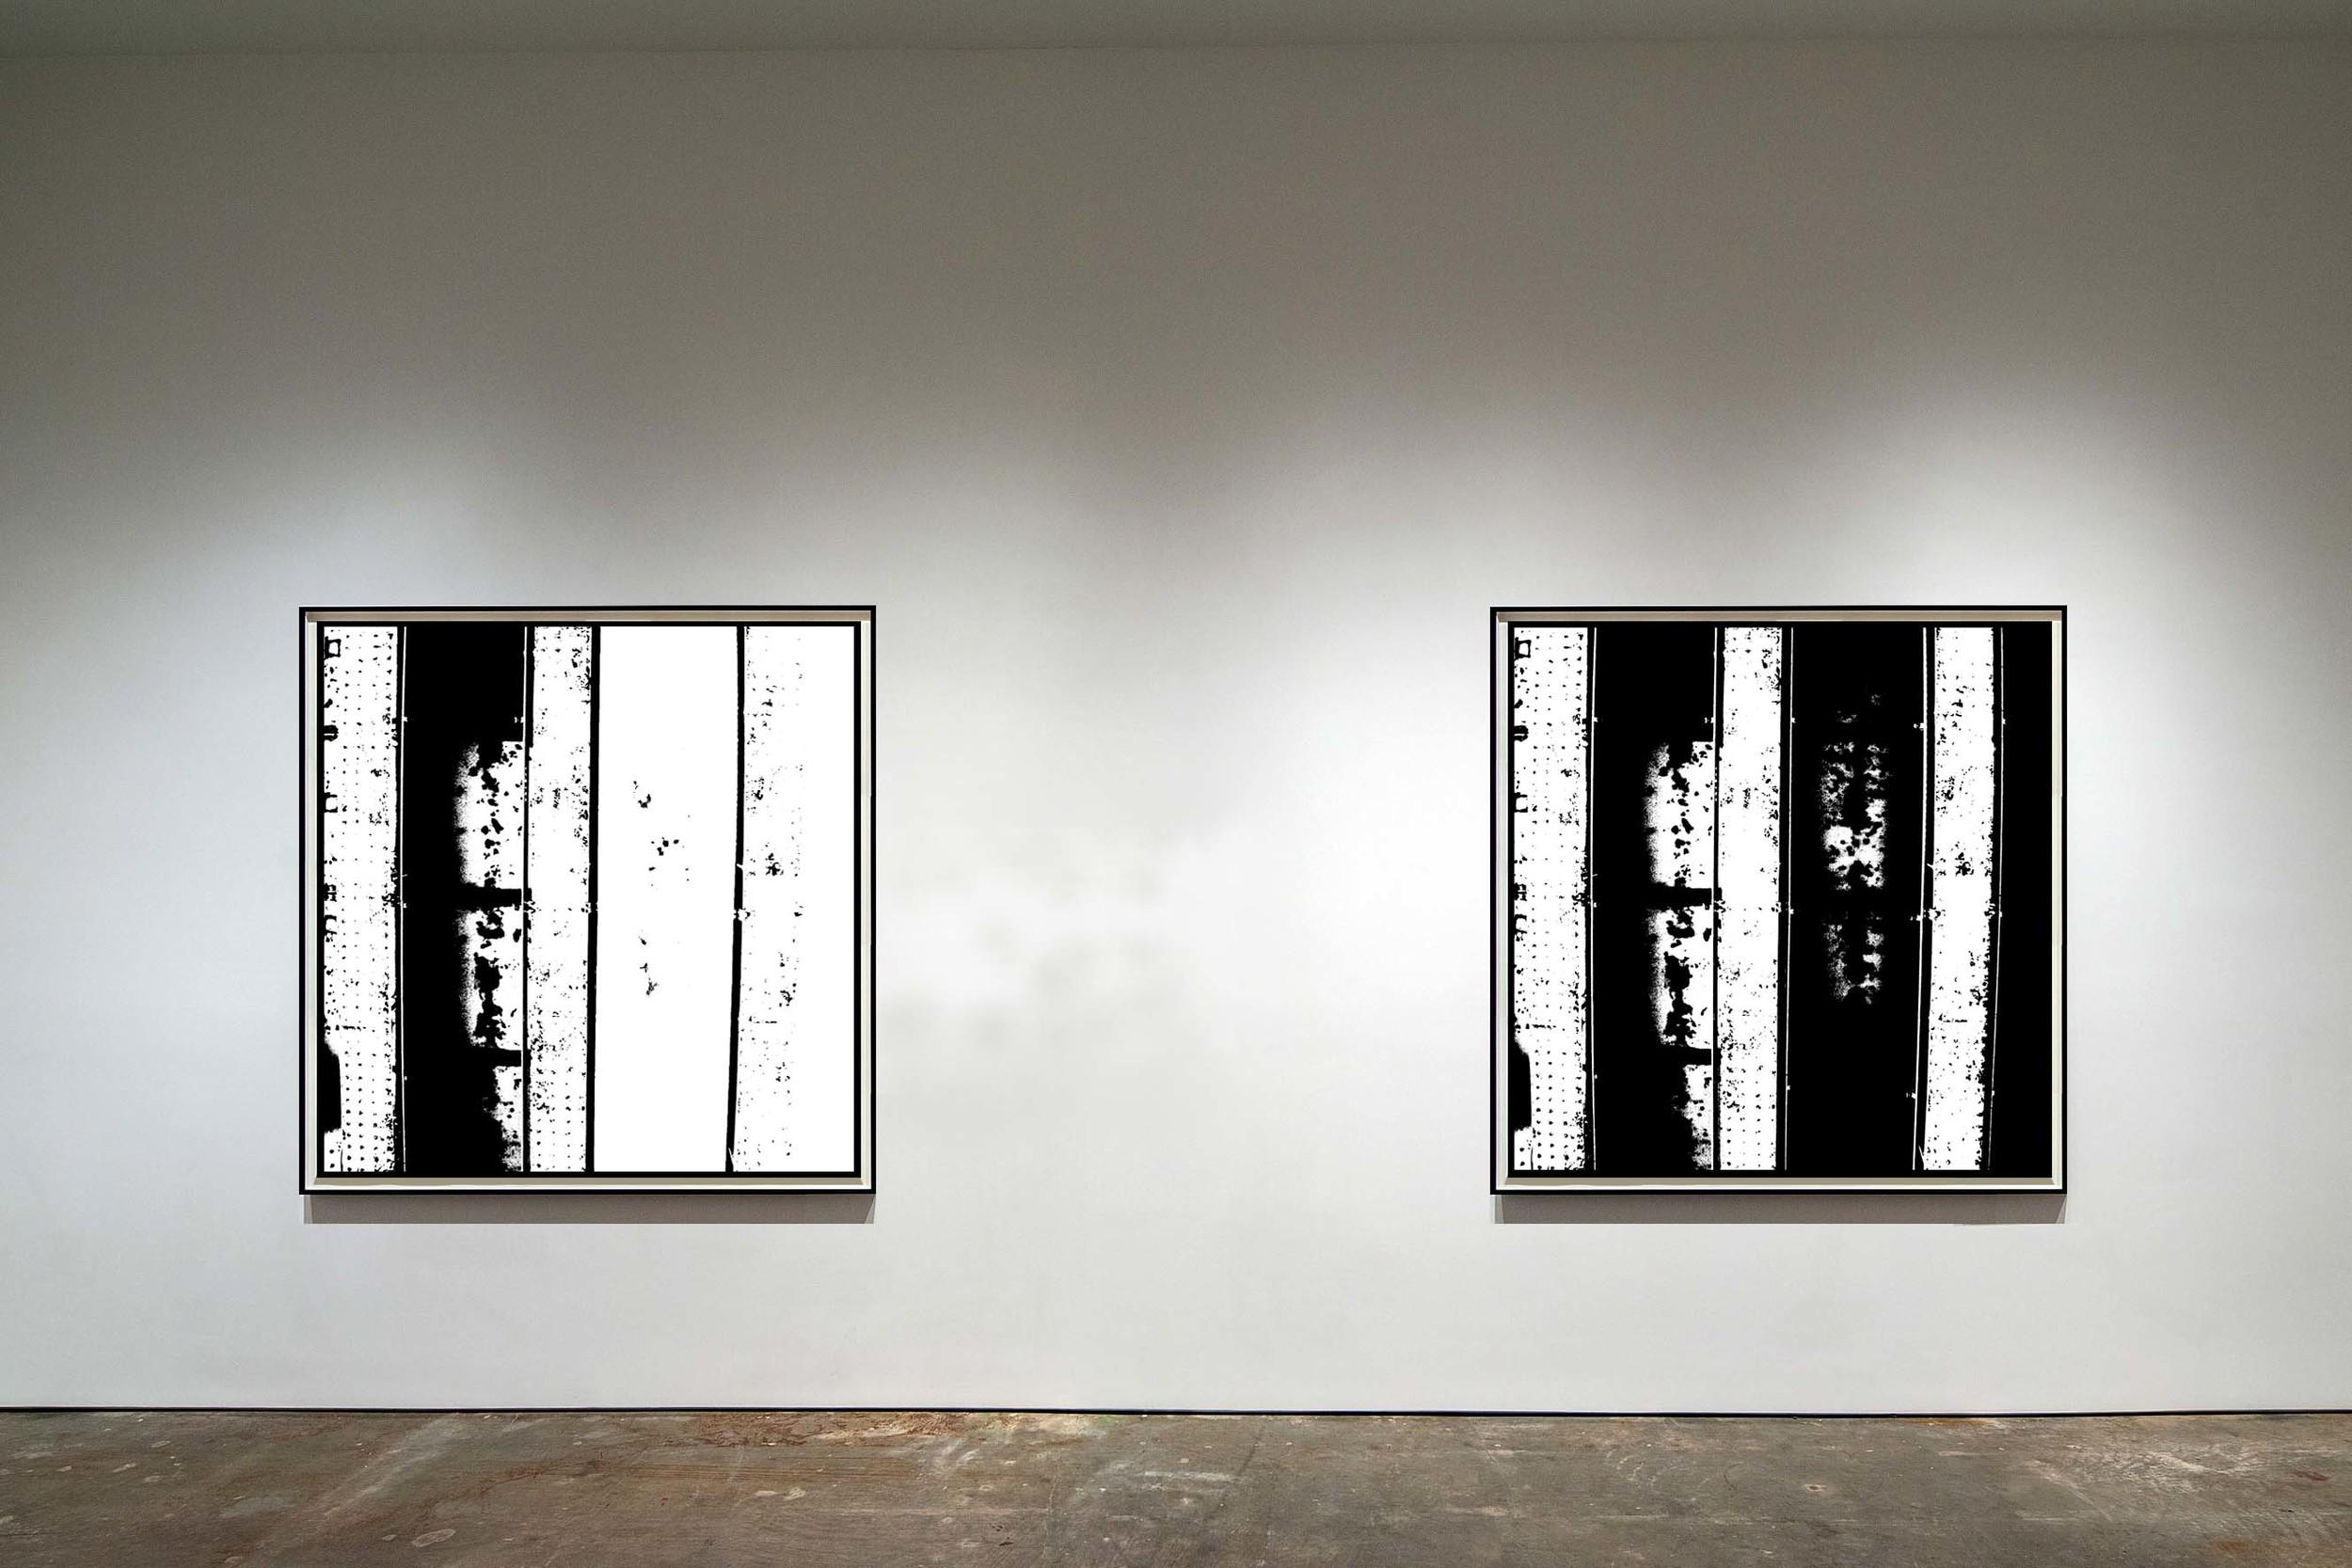 London below  - 2013 - Screen print on paper - 150 x 150 cm  - Edition of 01